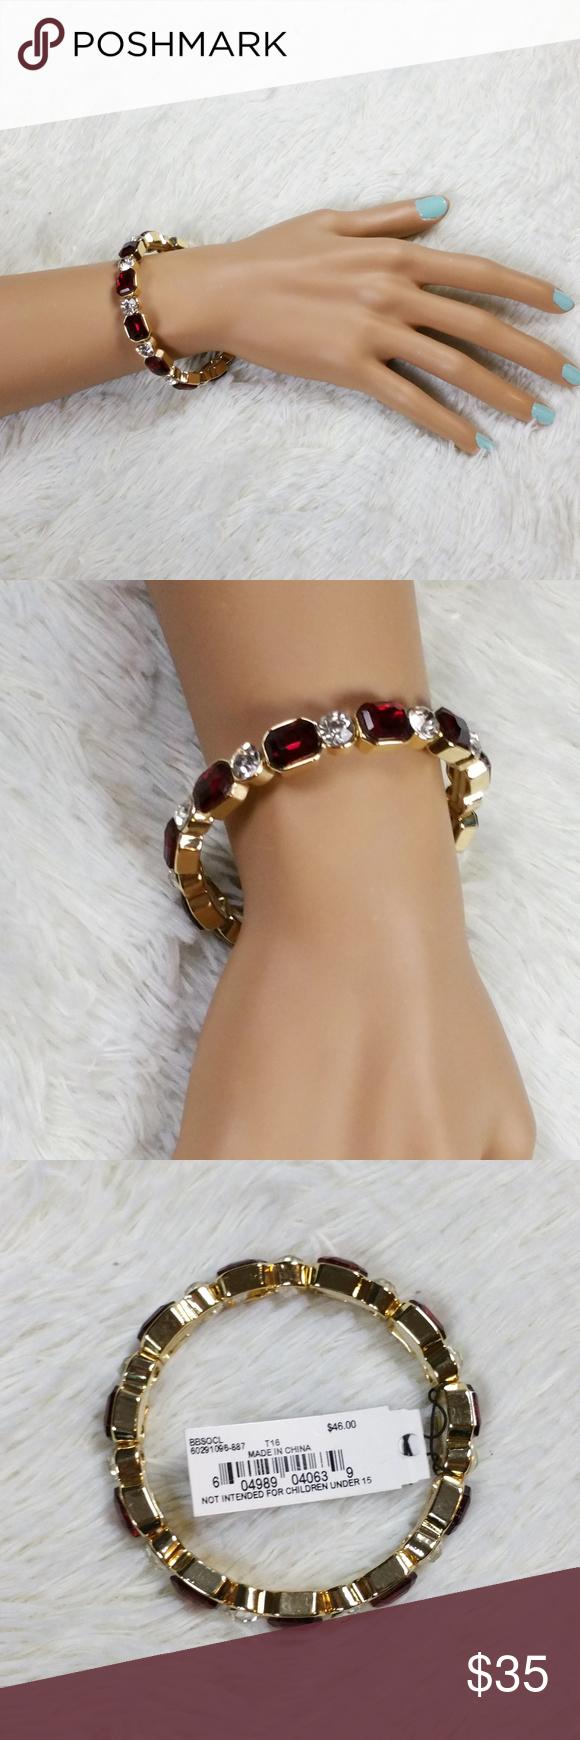 Anne klein bright nights ii red gold bracelet boutique red gold